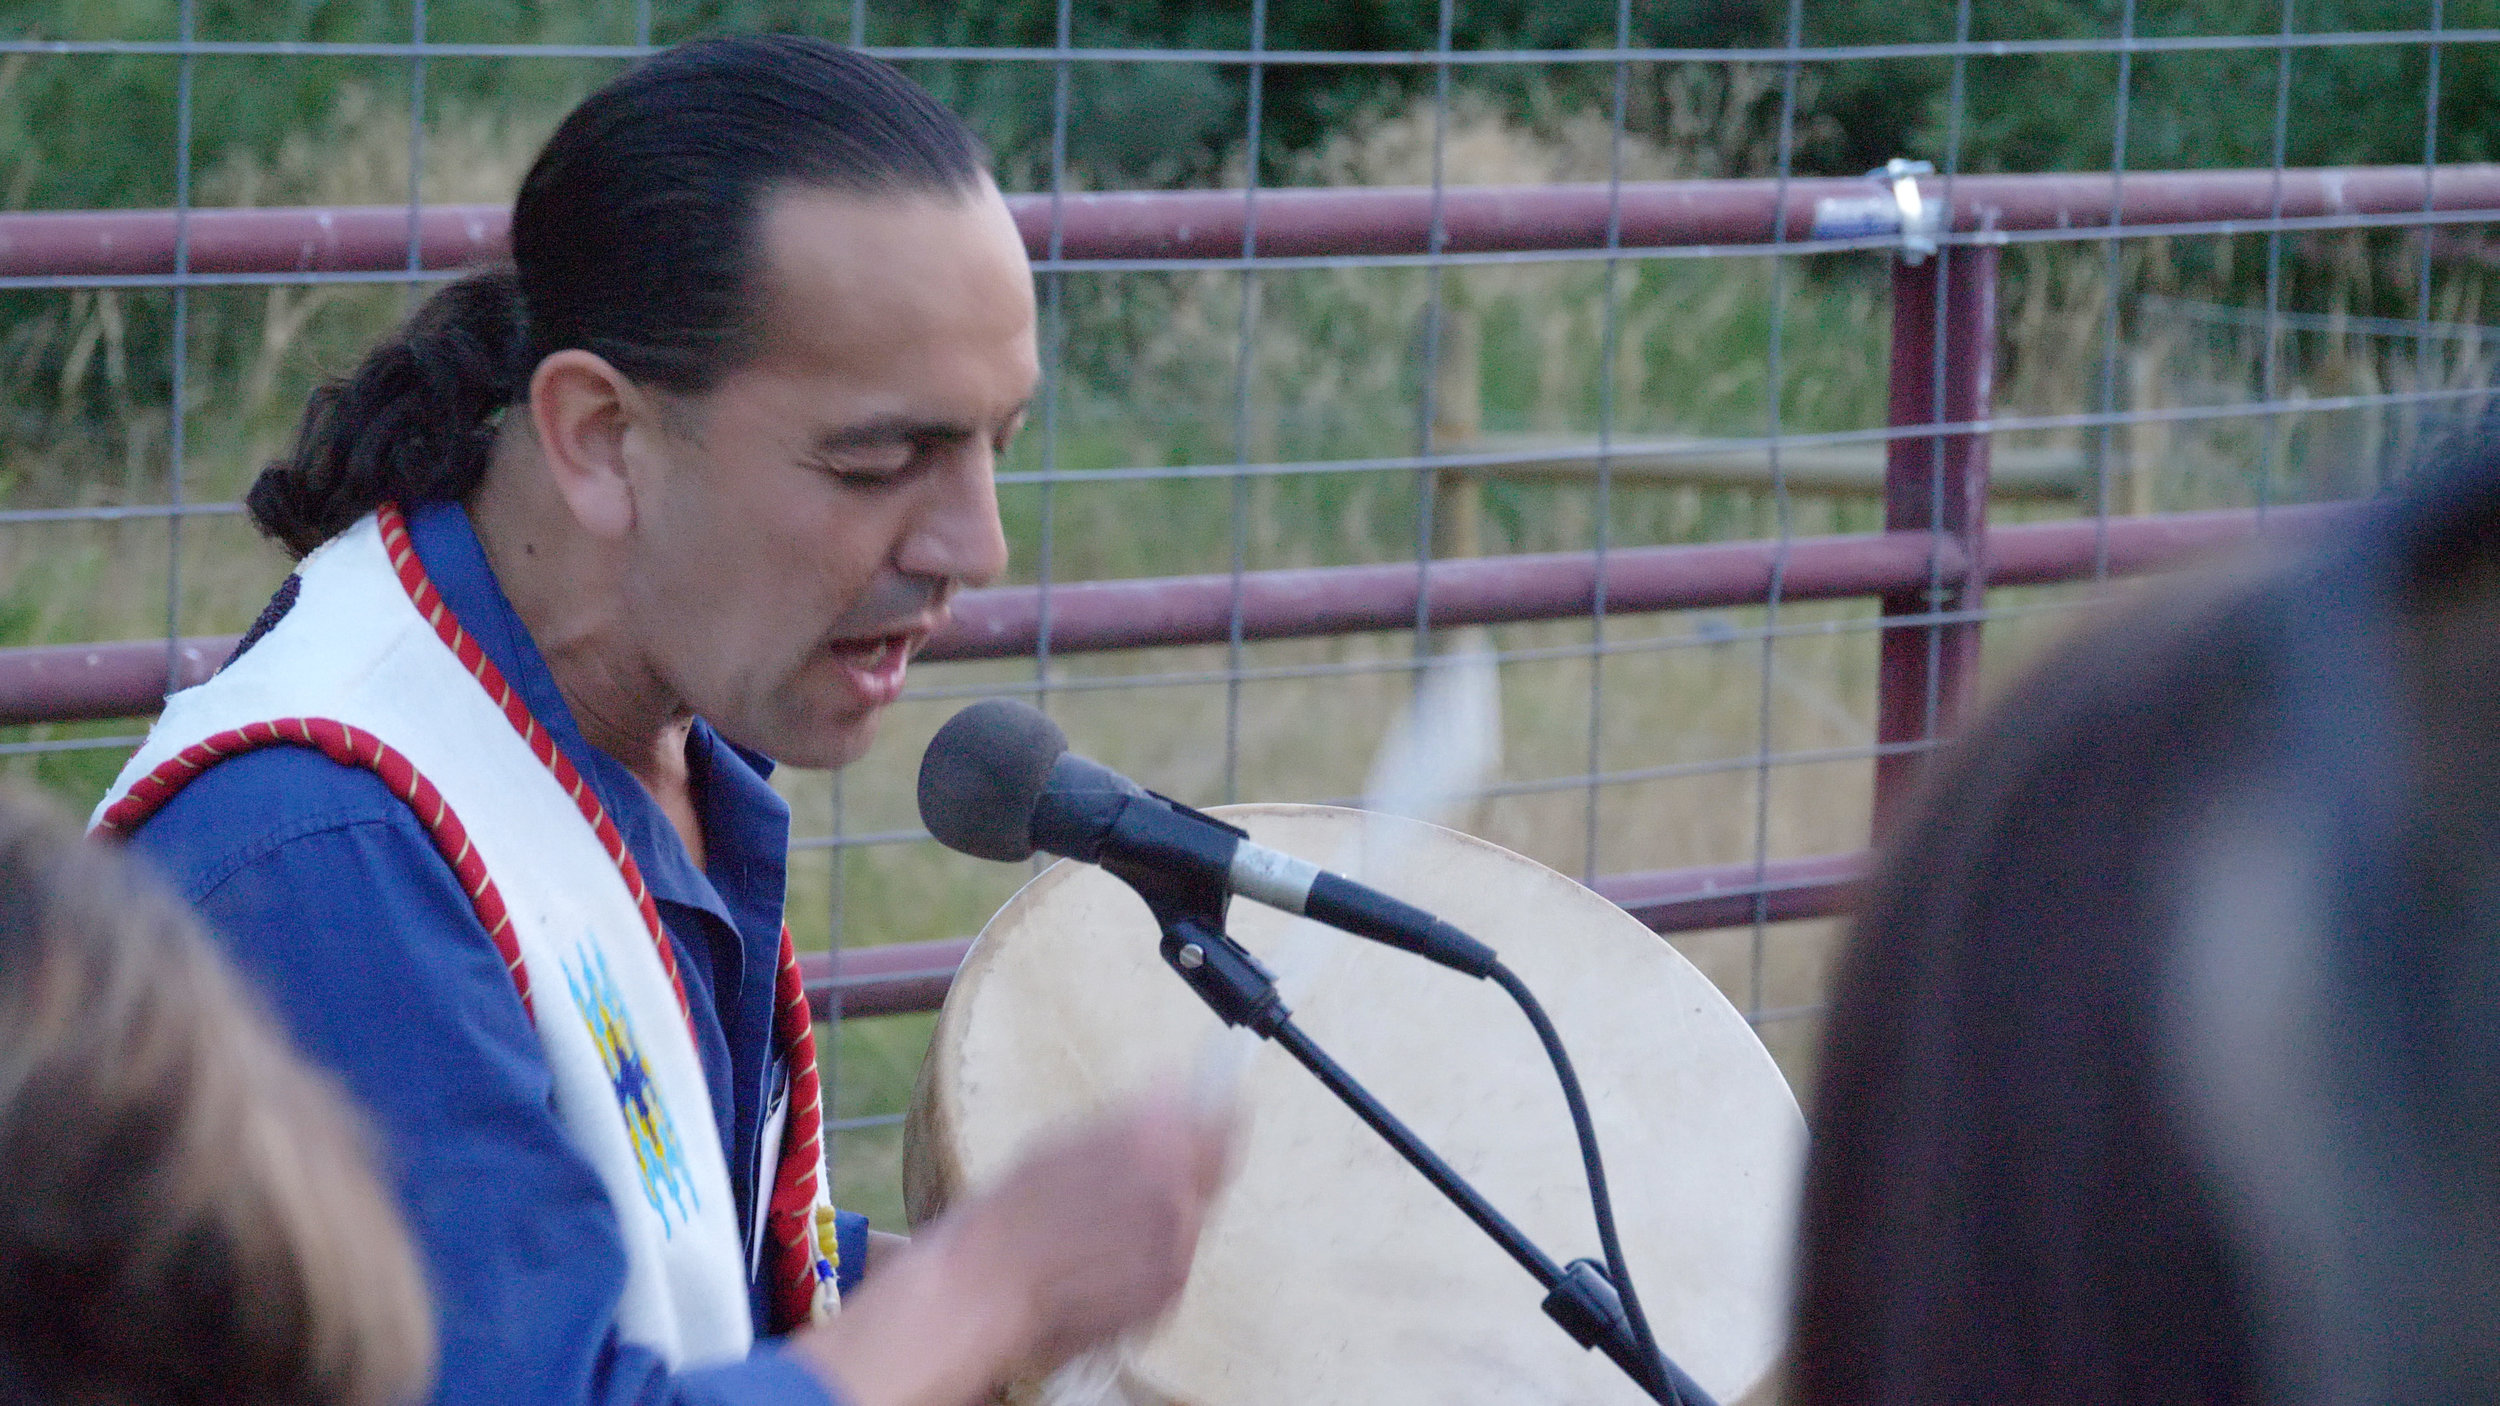 Shane Doyle, Singer and Native American Scholar: Jason Berlage